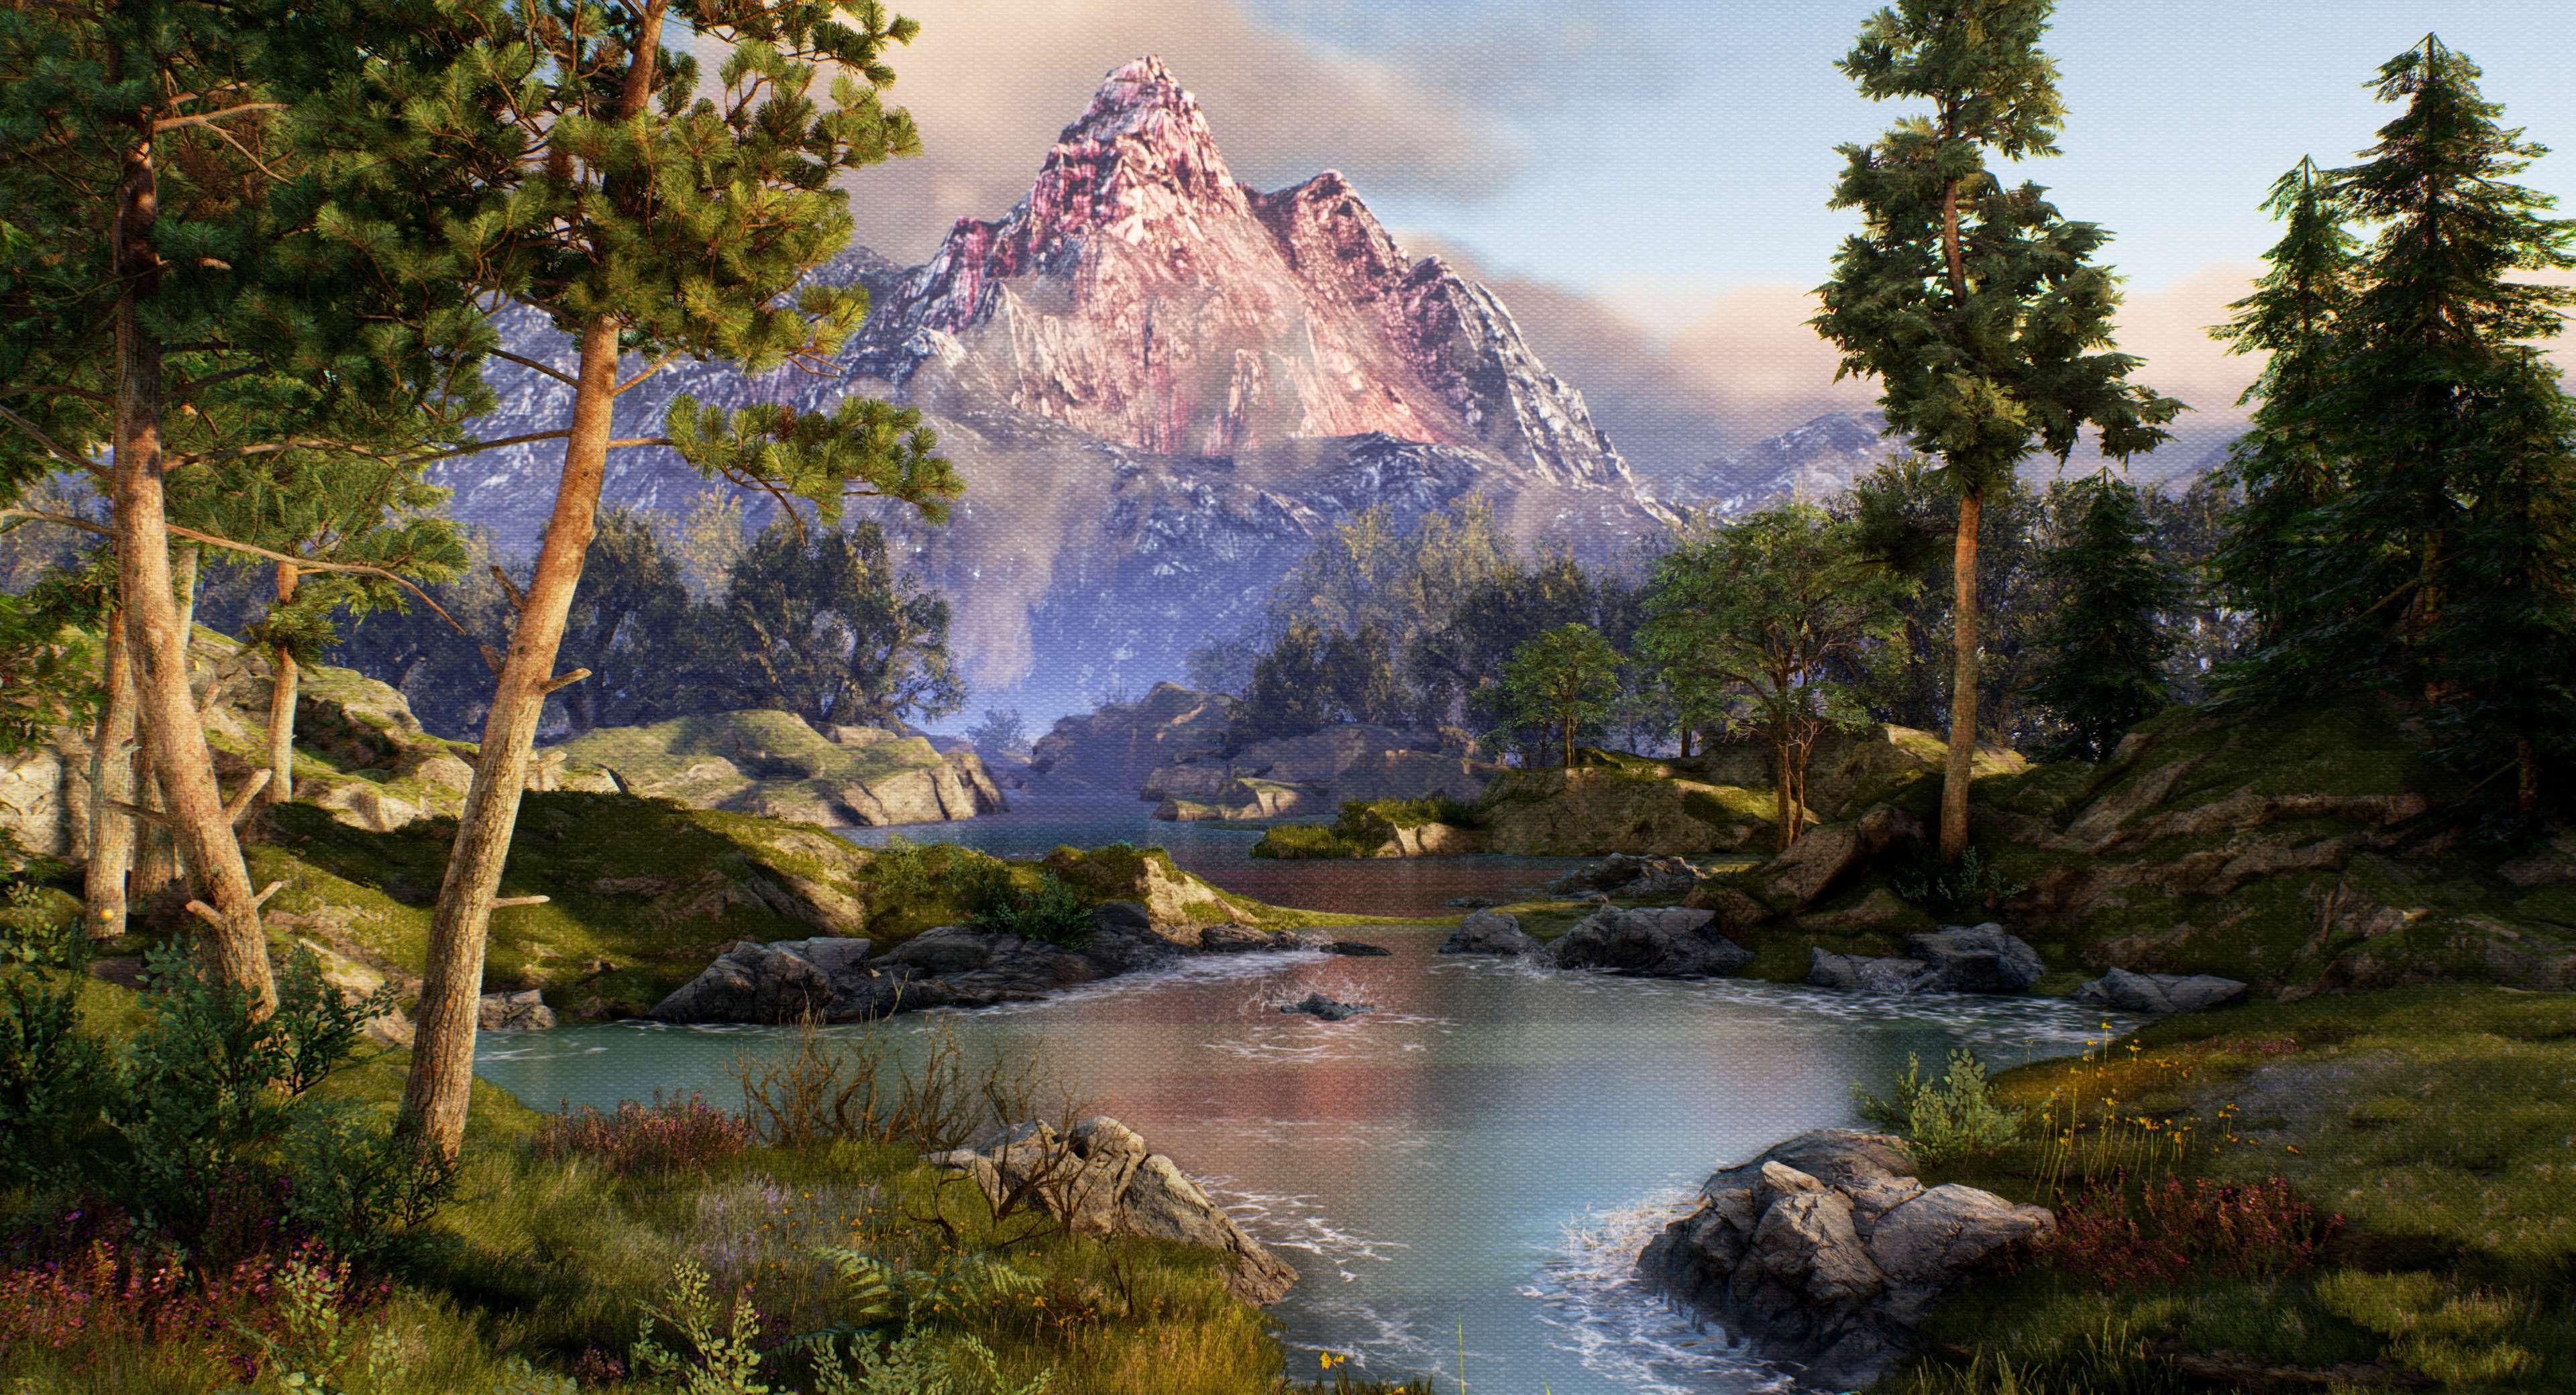 speedtree, epic games, unreal engine 4, ue4, gamedev, 3ds